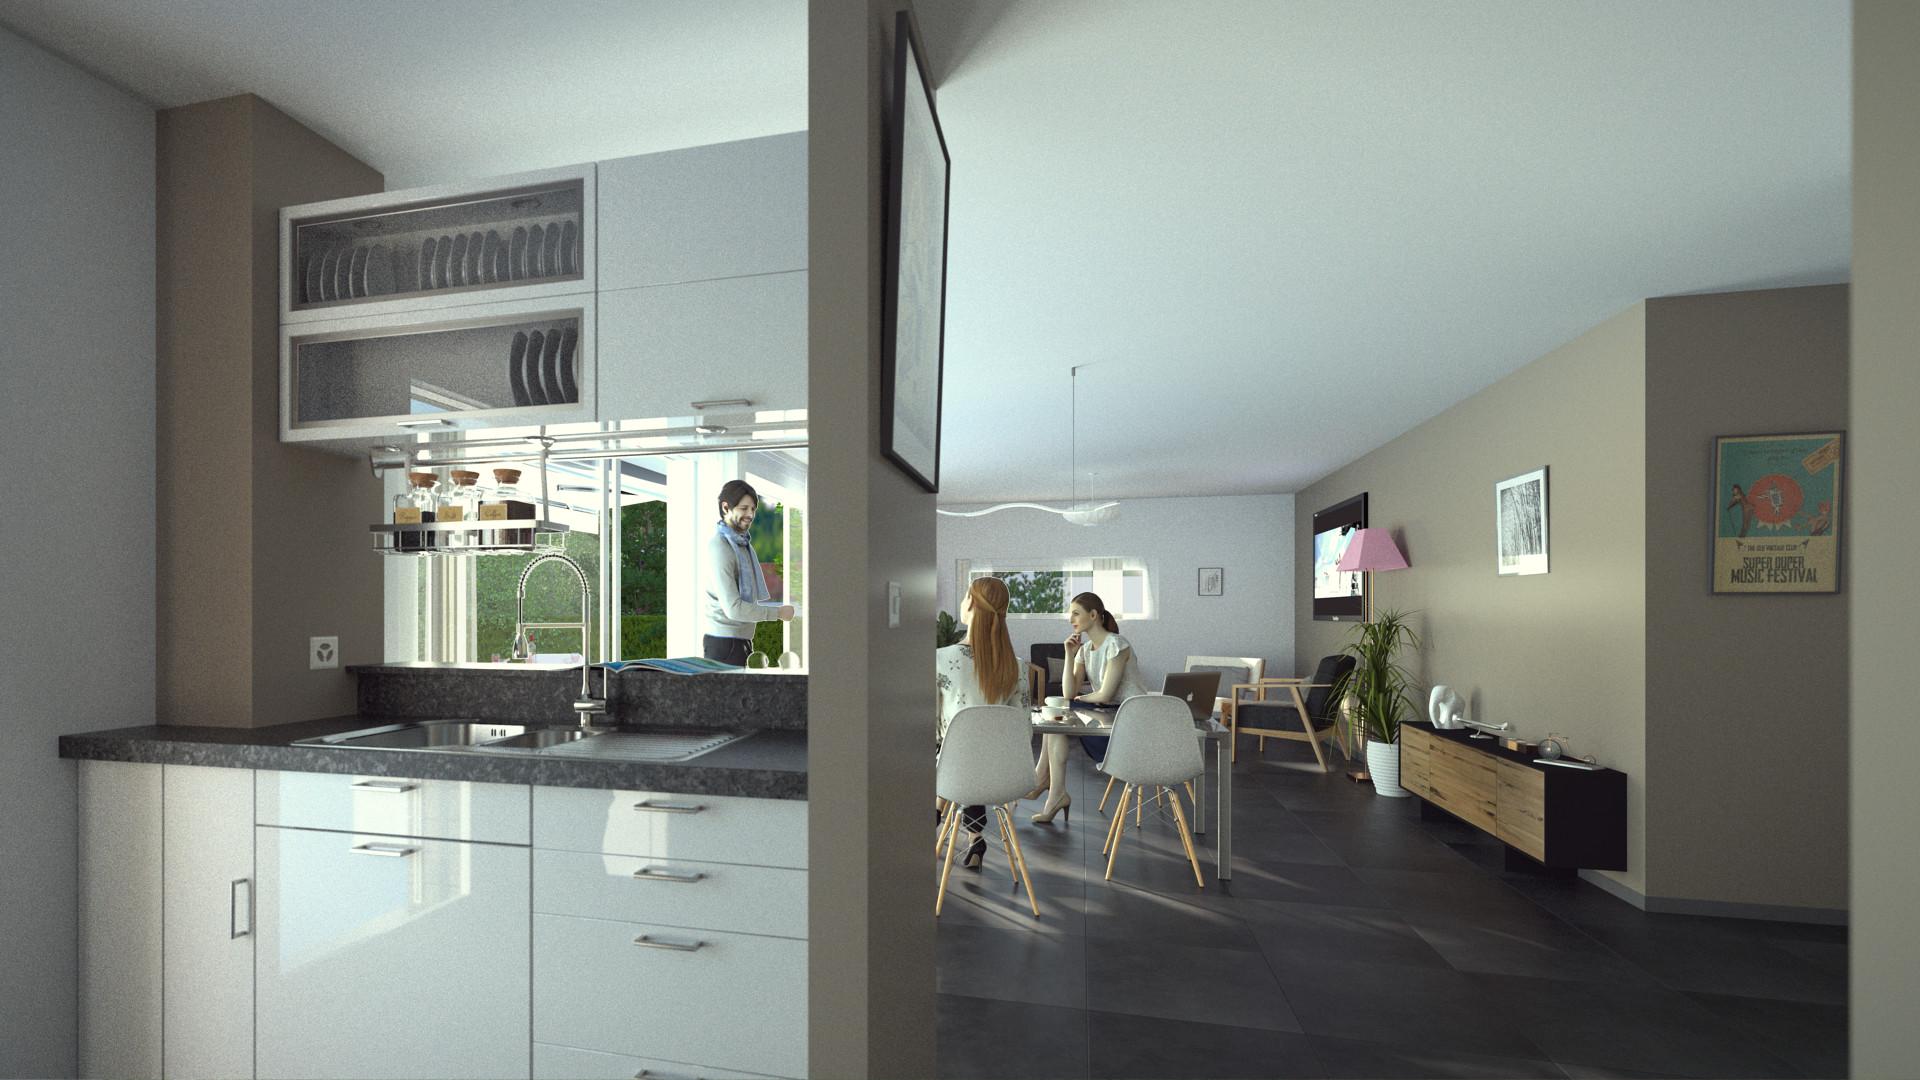 Duane kemp house model test 2 scene 8 kitchen living rm 2pt ext combined